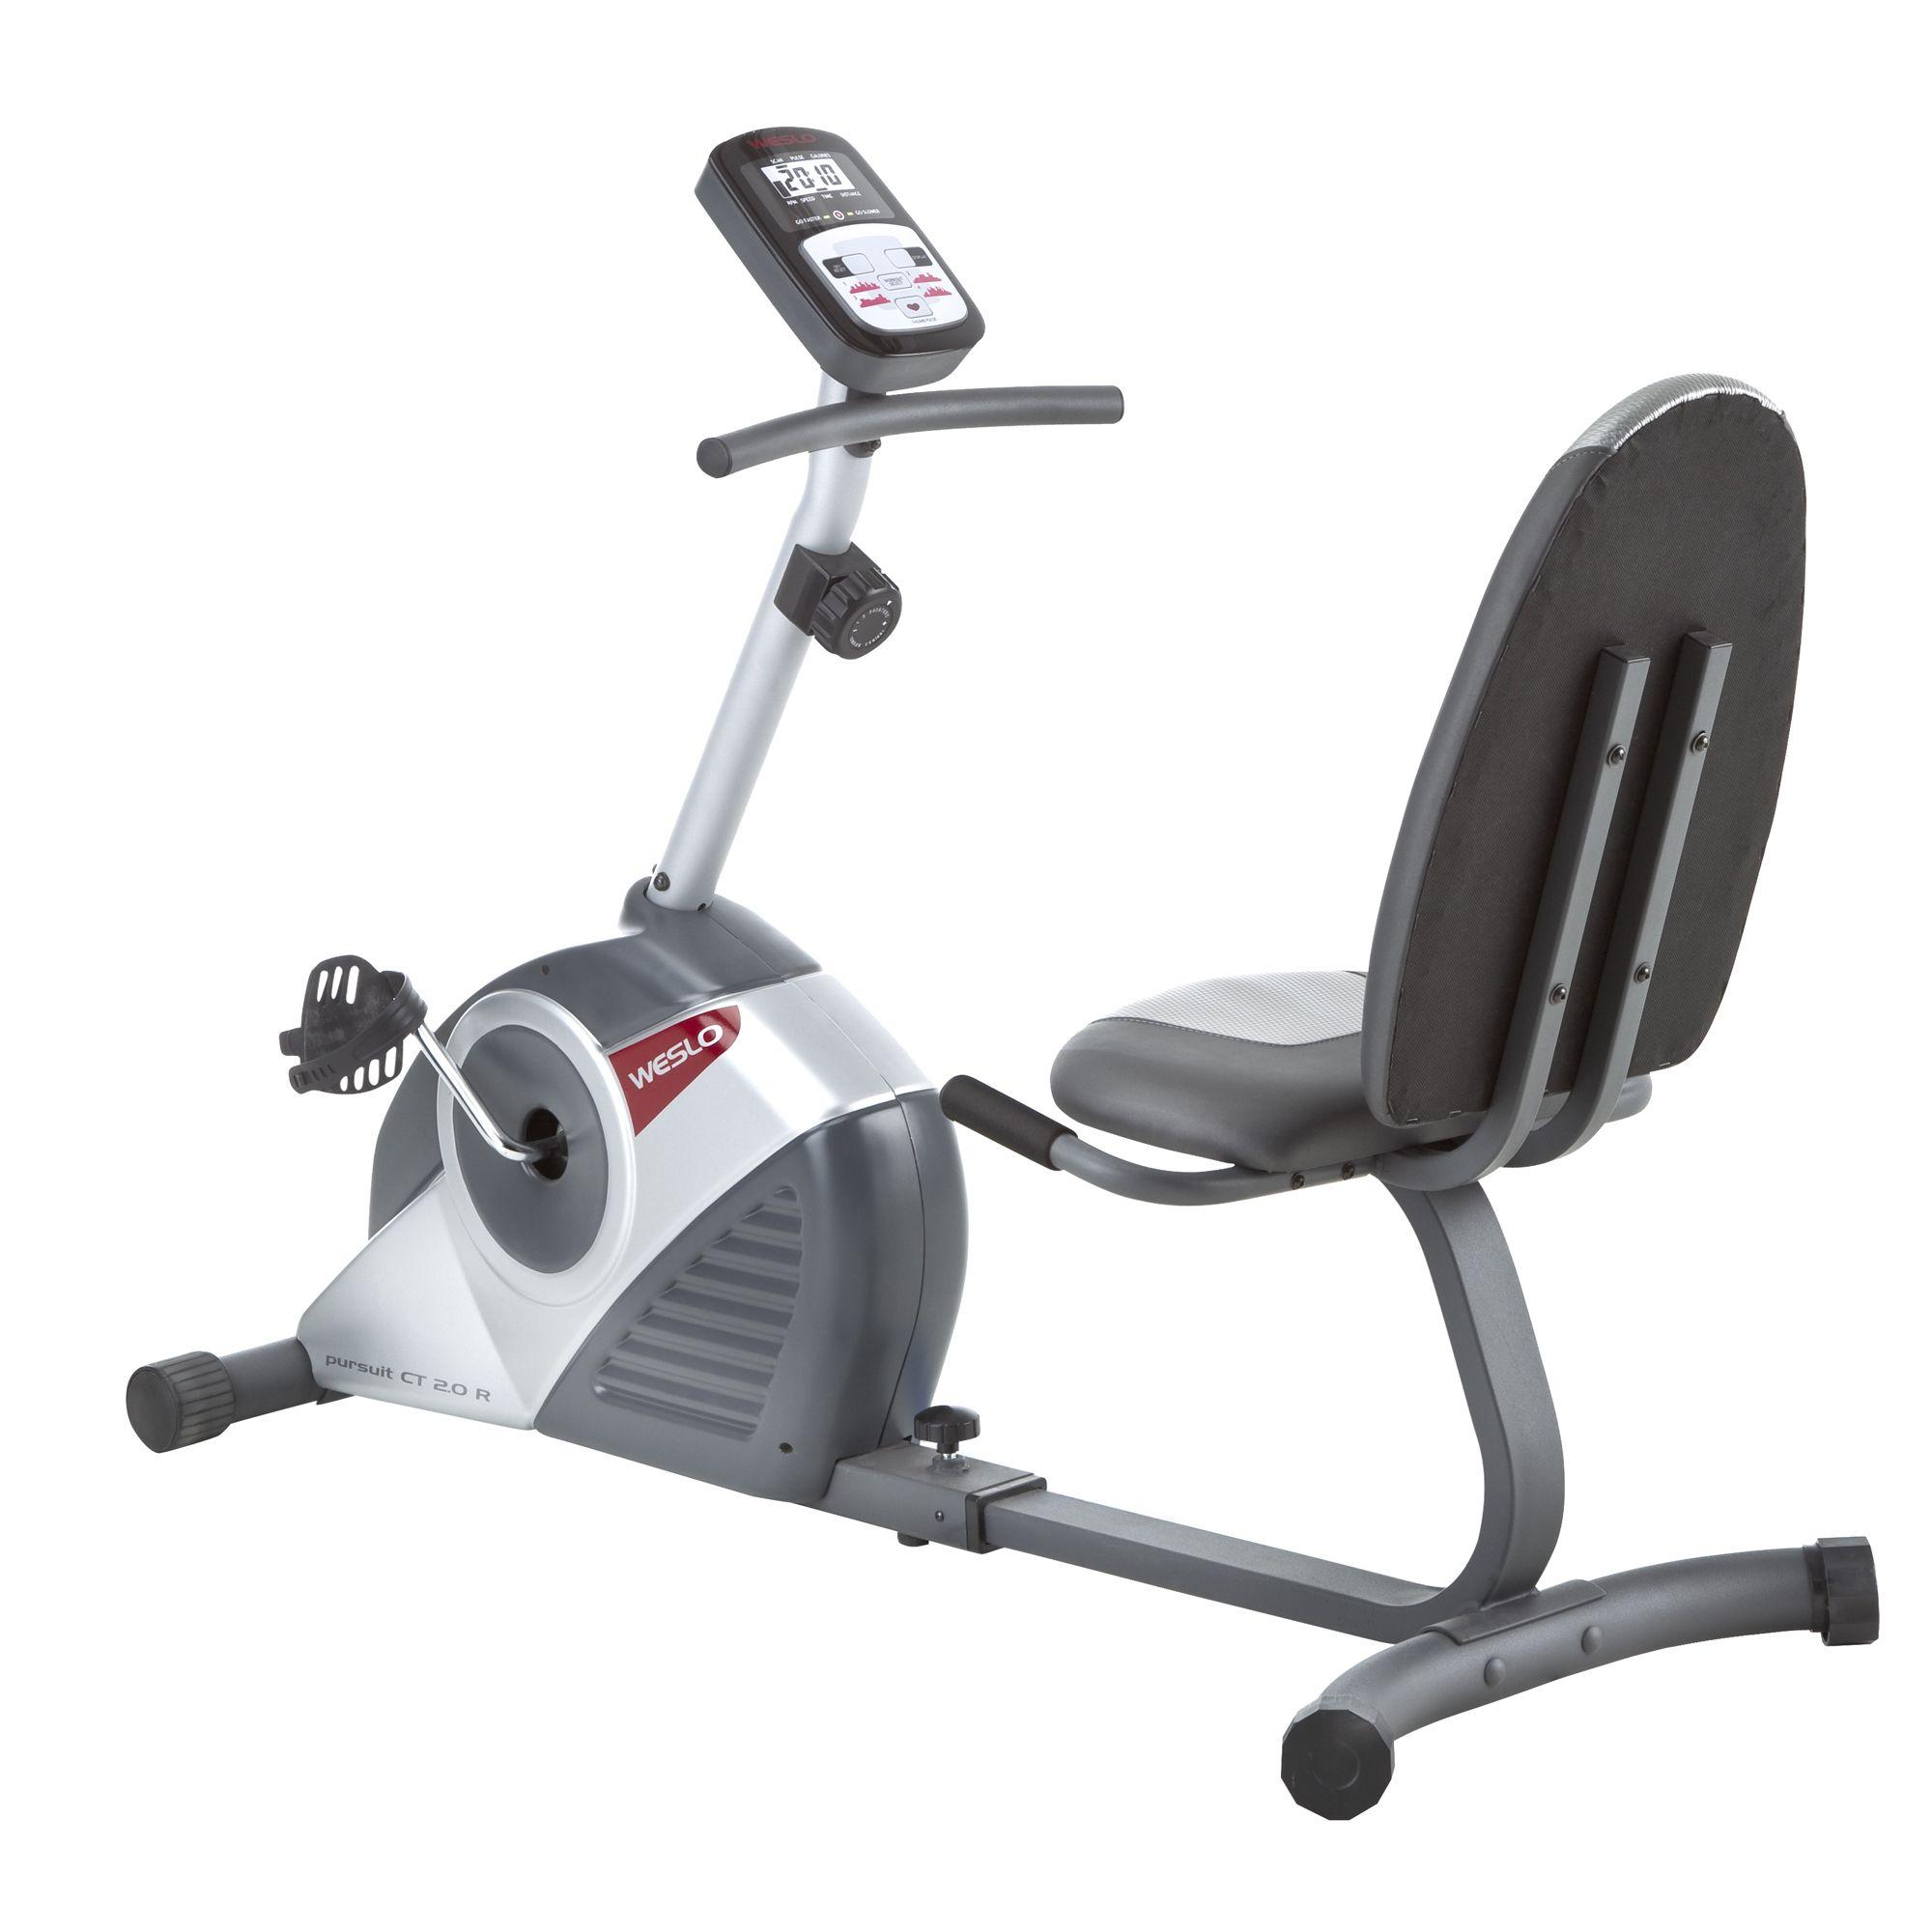 Pt fitness personal trainer recumbent bike manual